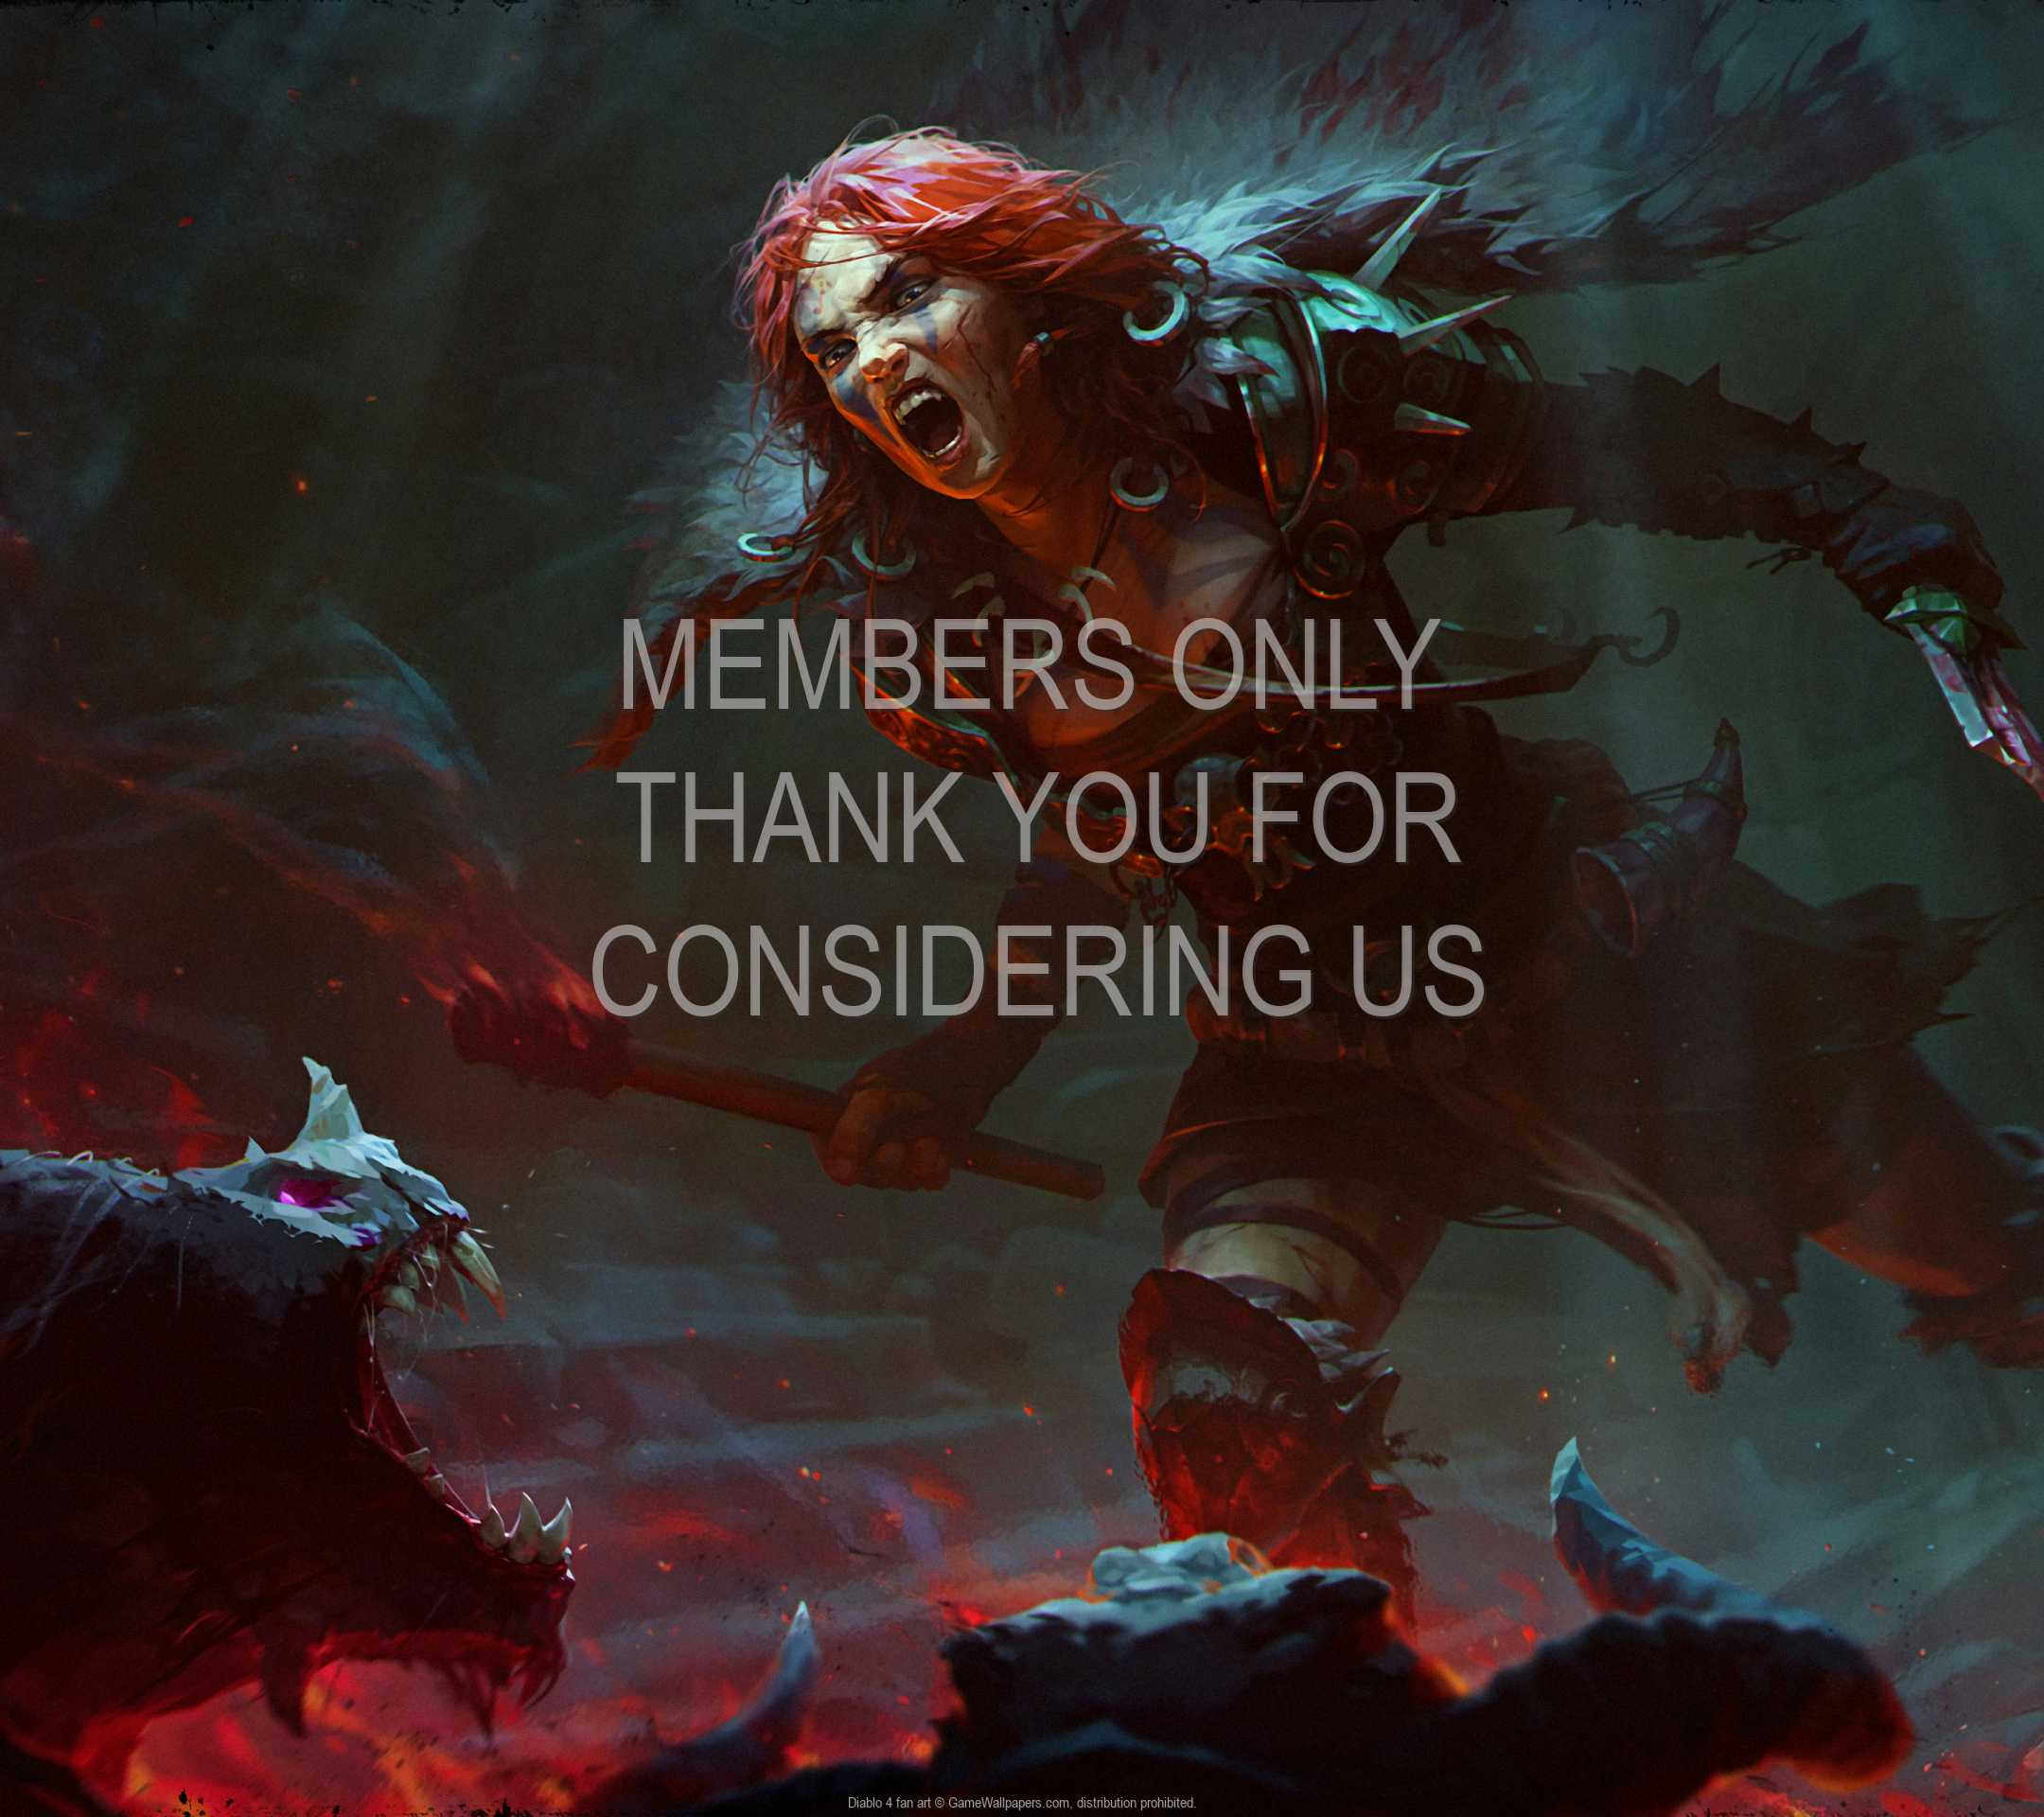 Diablo 4 fan art 1080p Horizontal Handy Hintergrundbild 01